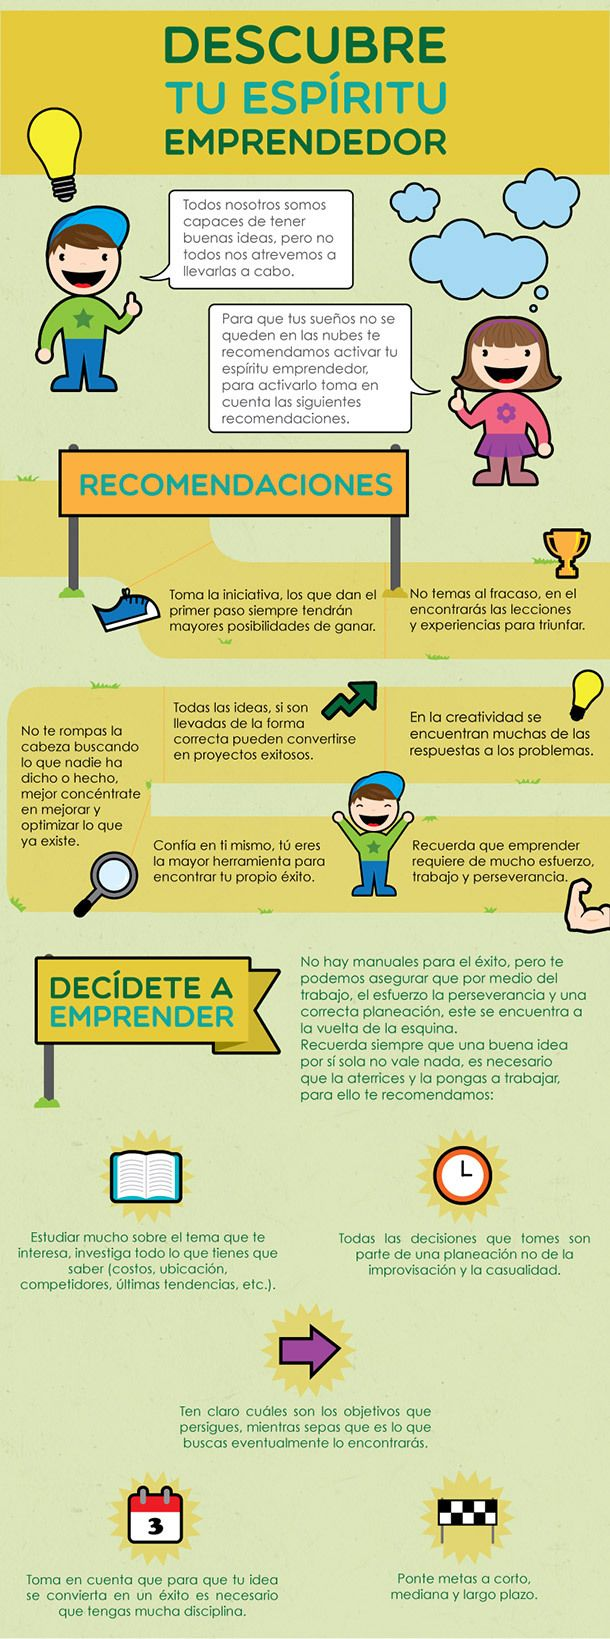 Descubre tu espíritu #emprendedor #infografia #infographic #entrepreneurship